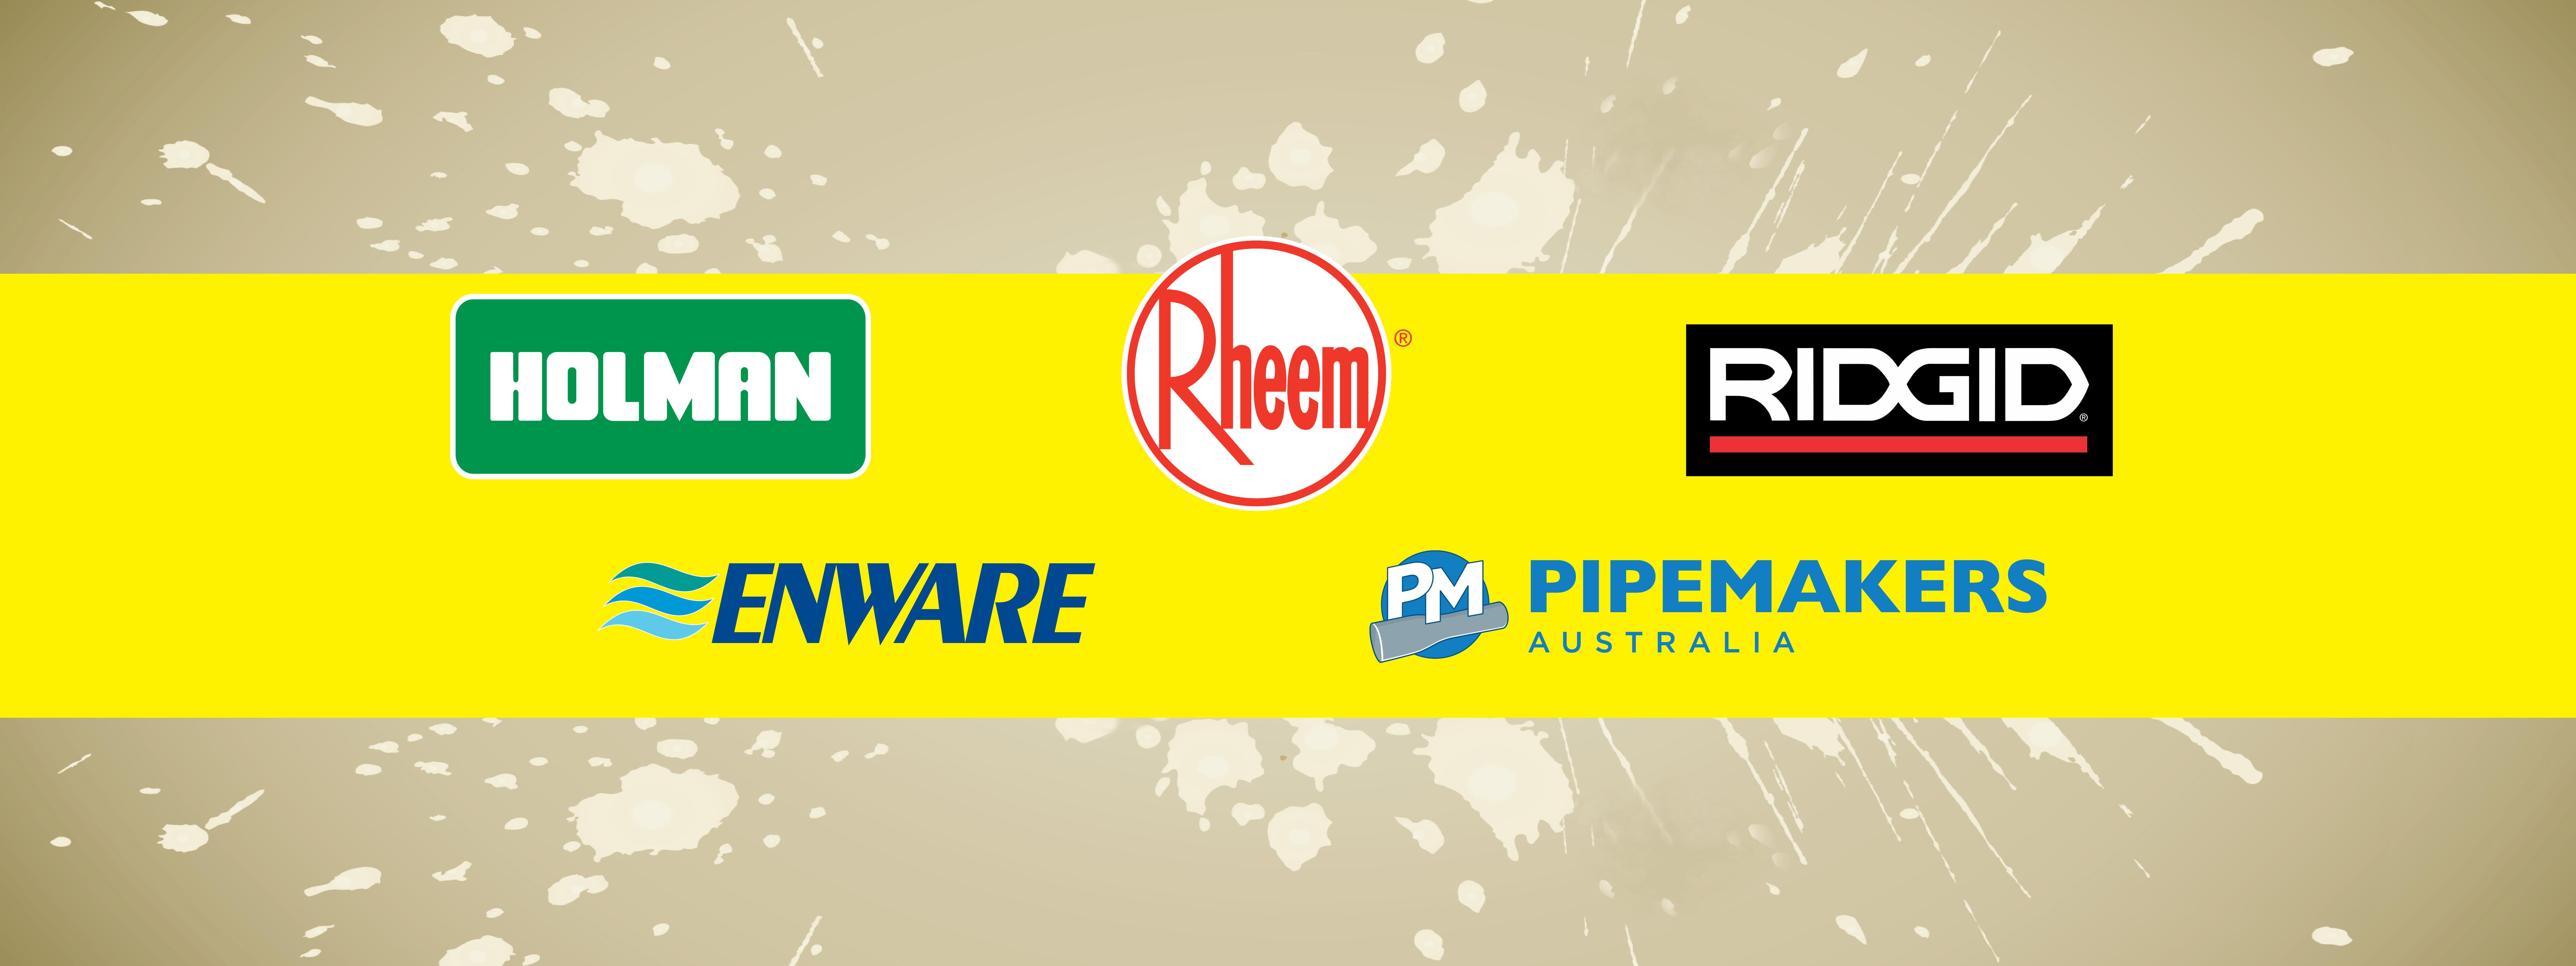 Plumbers' Supplies Co-operative